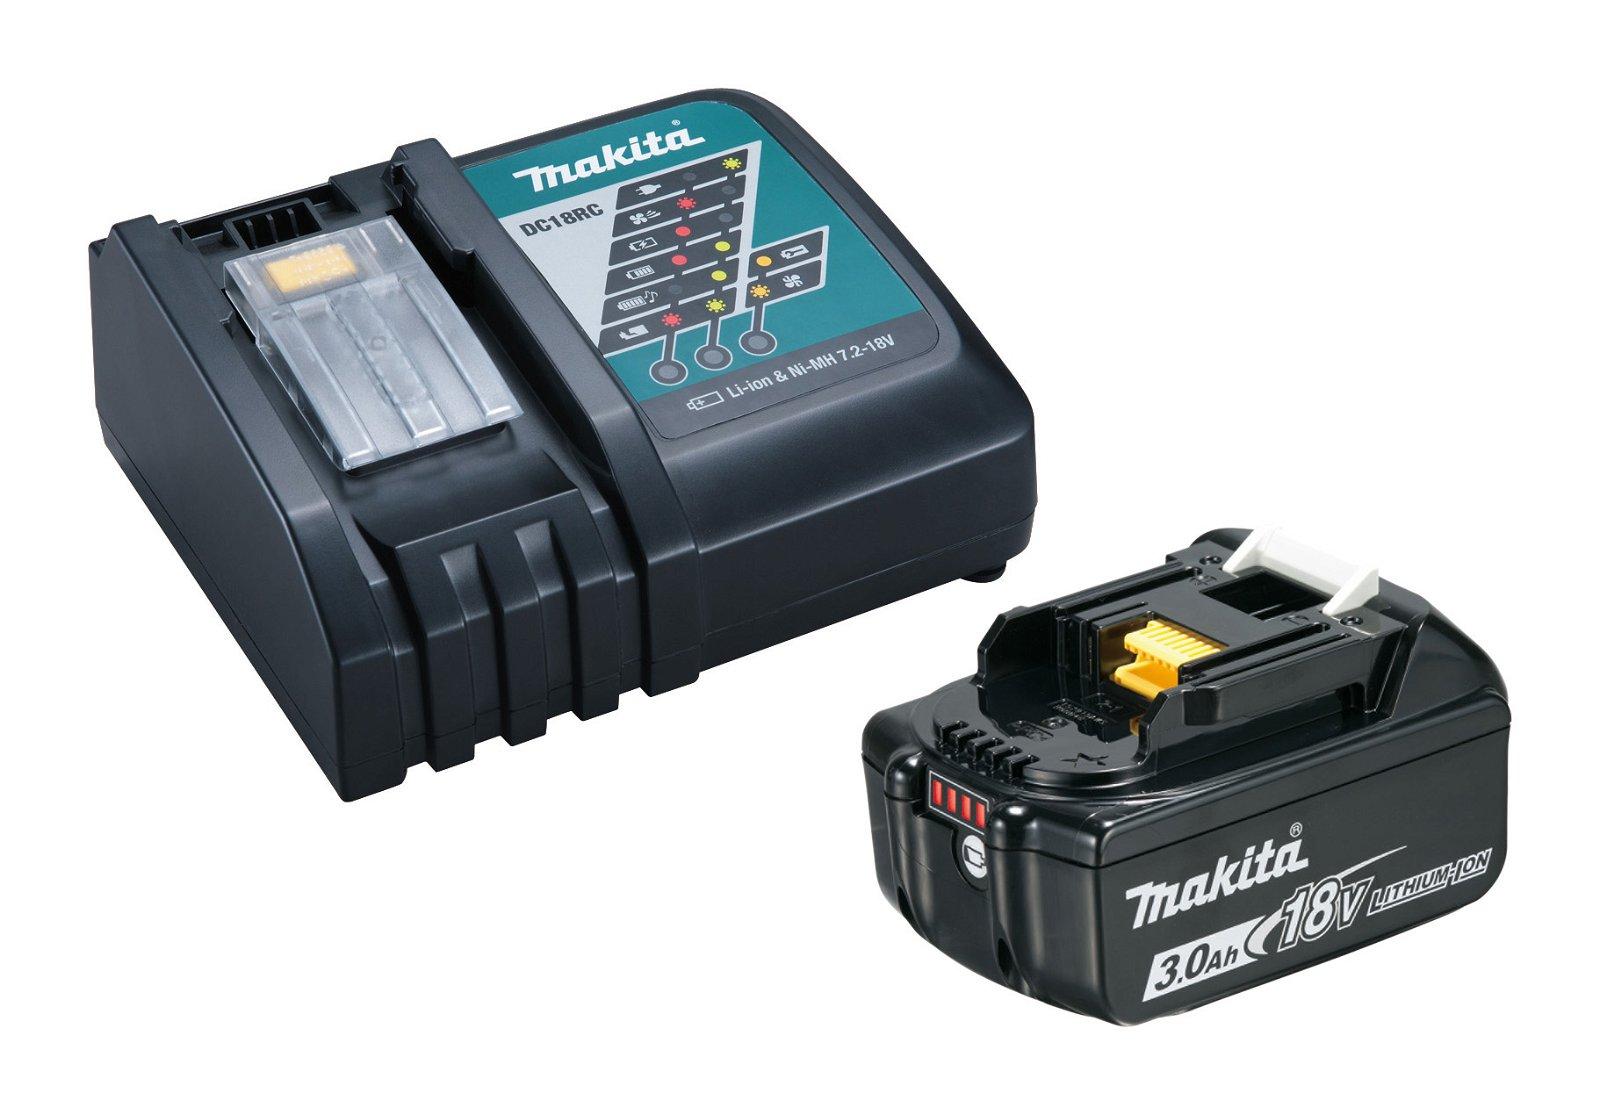 Makita LTX® BL1830B/DC18RC batteripakke